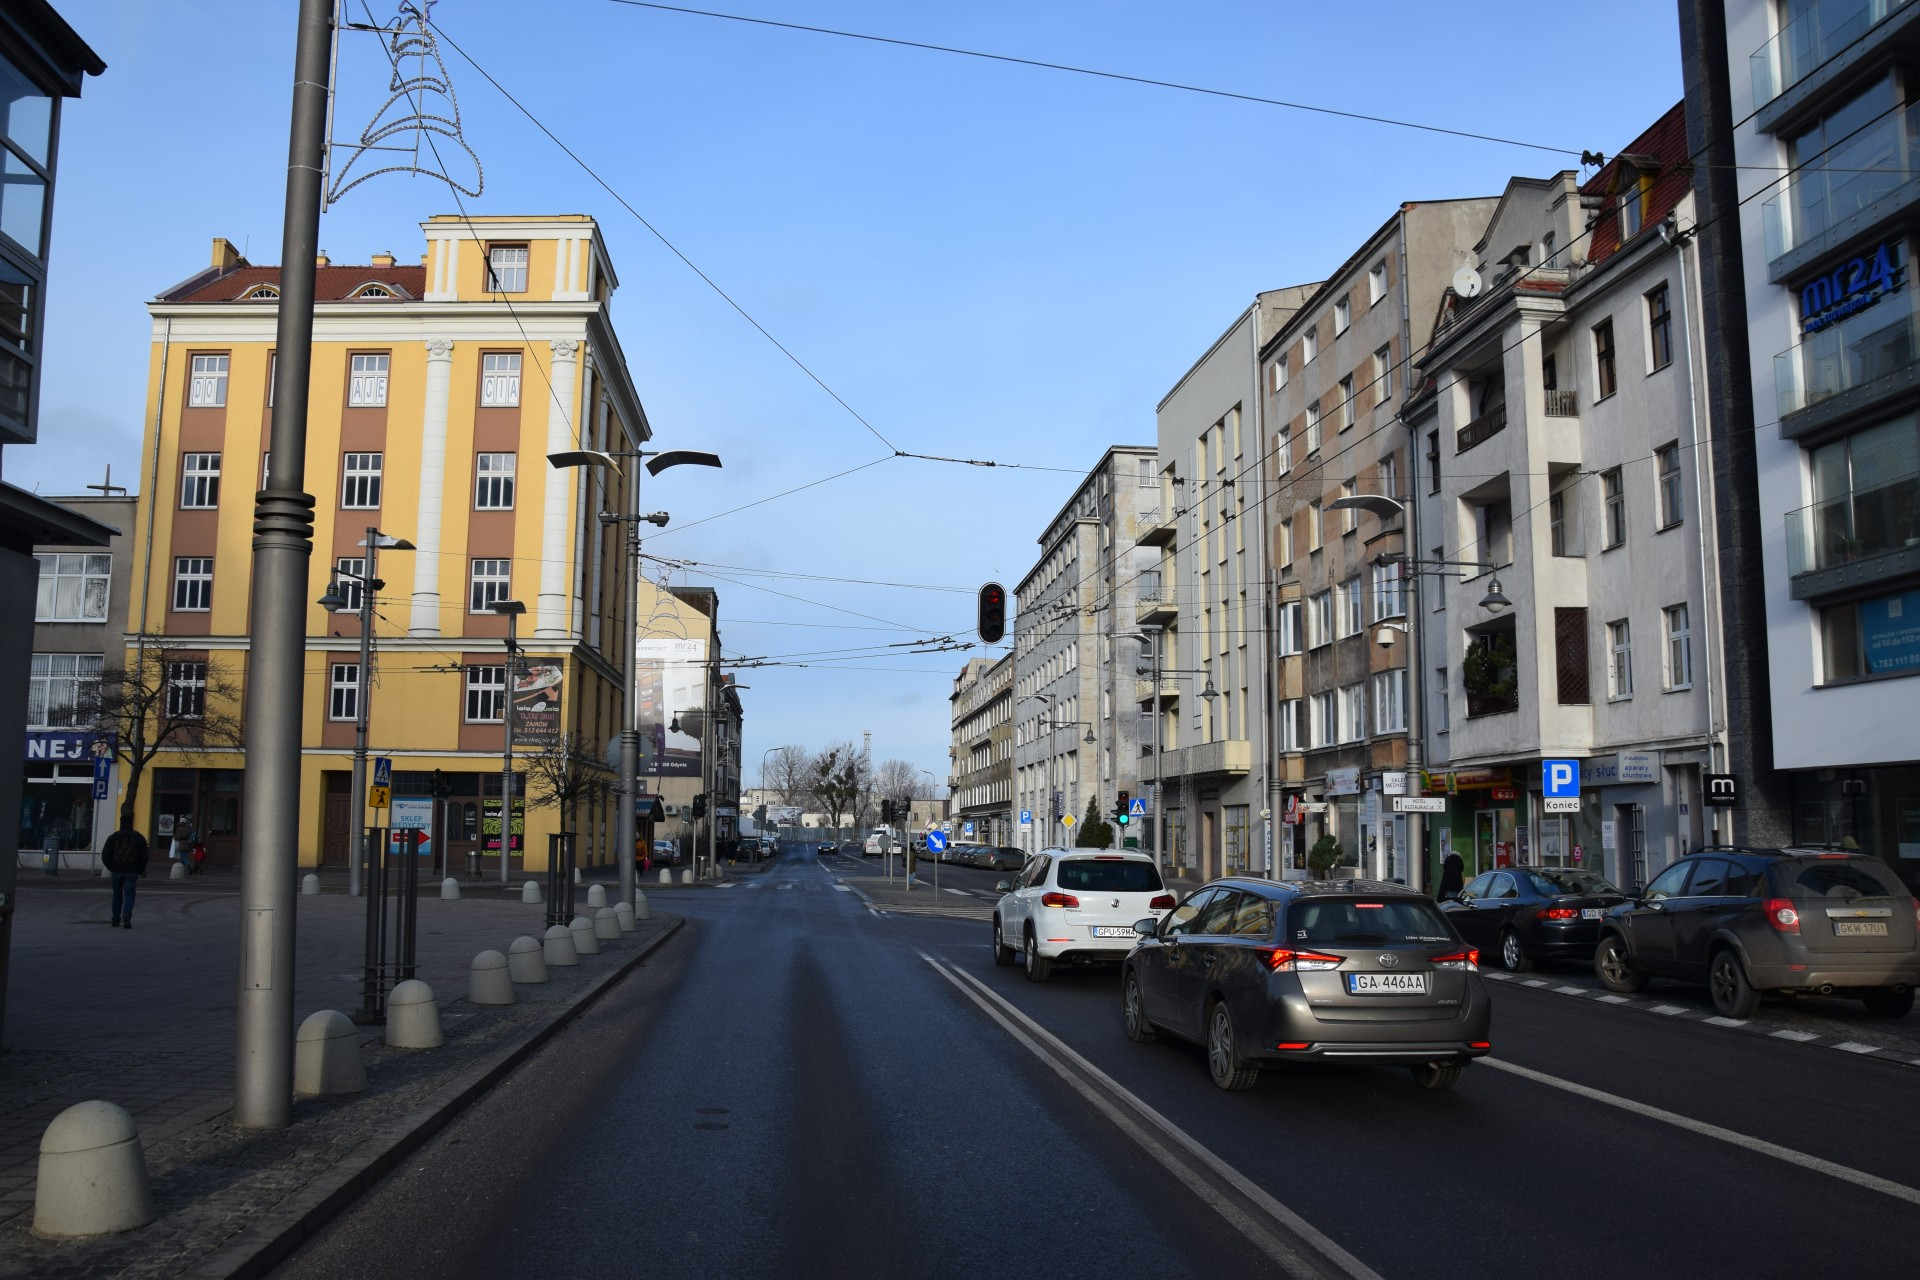 Kaszubska Gdynia. Kaszubski dąb 12